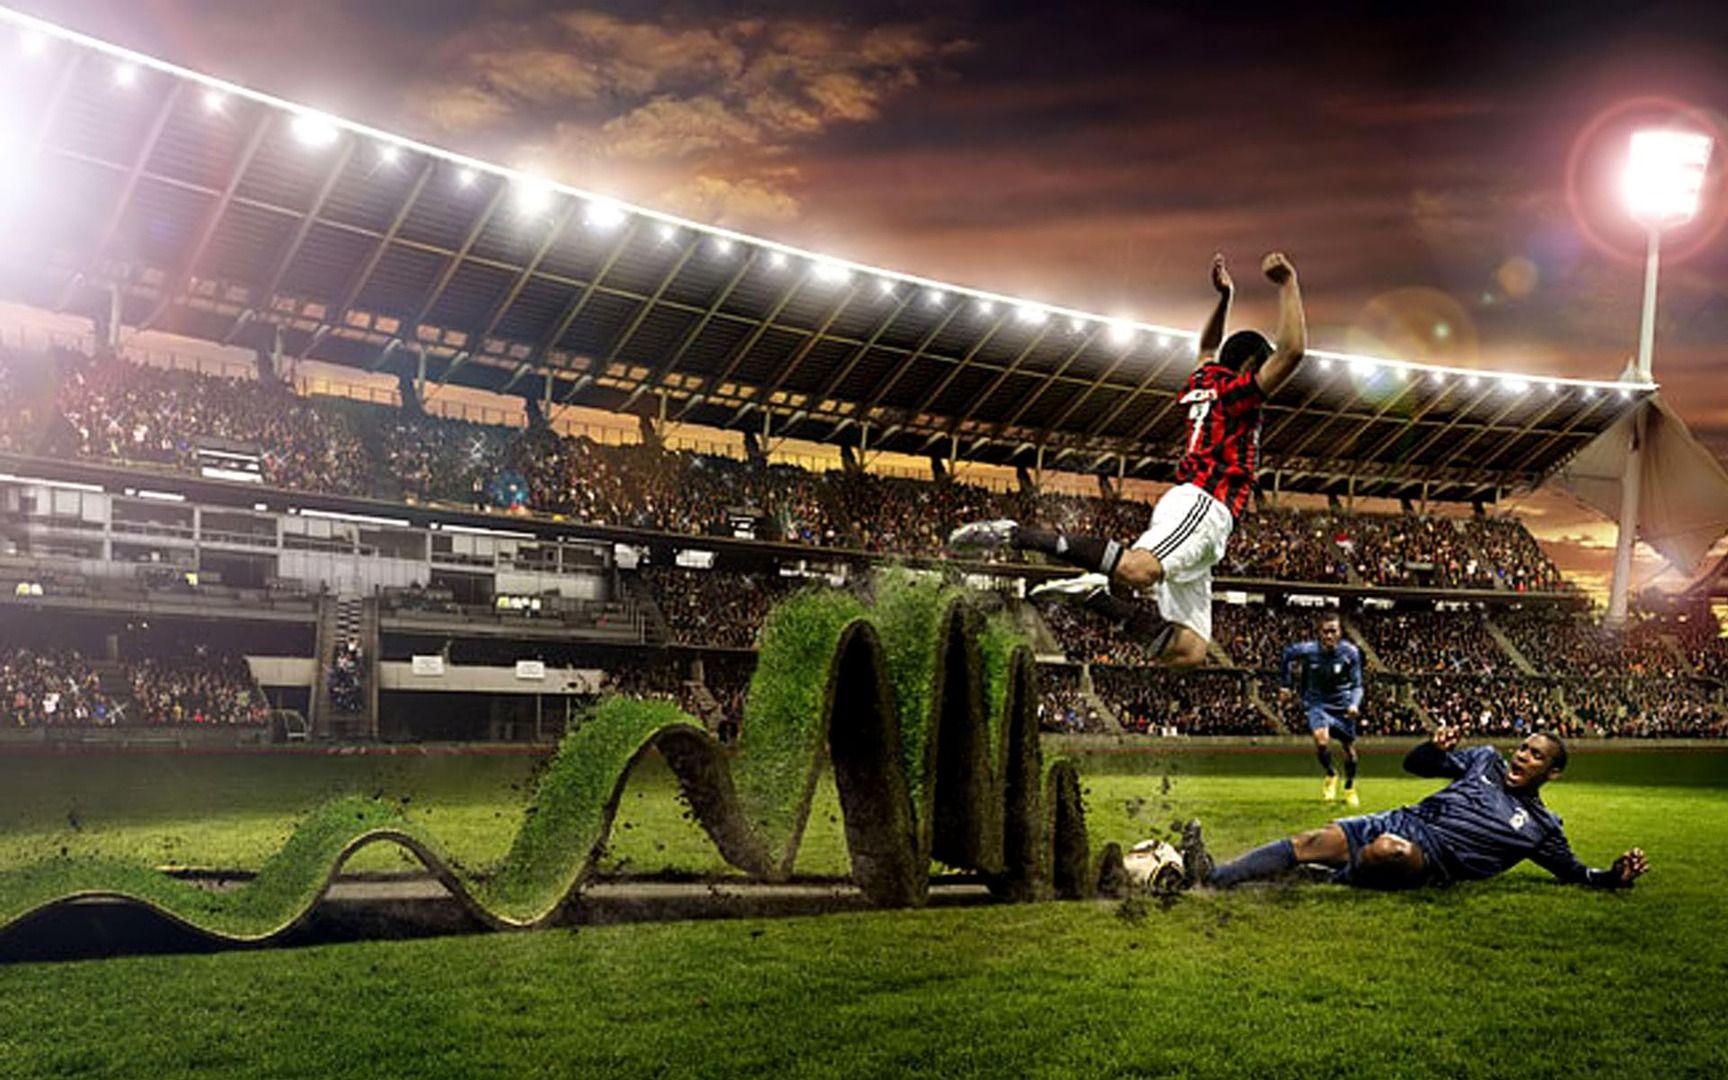 wallpapers hd futbol, soccer desktop background